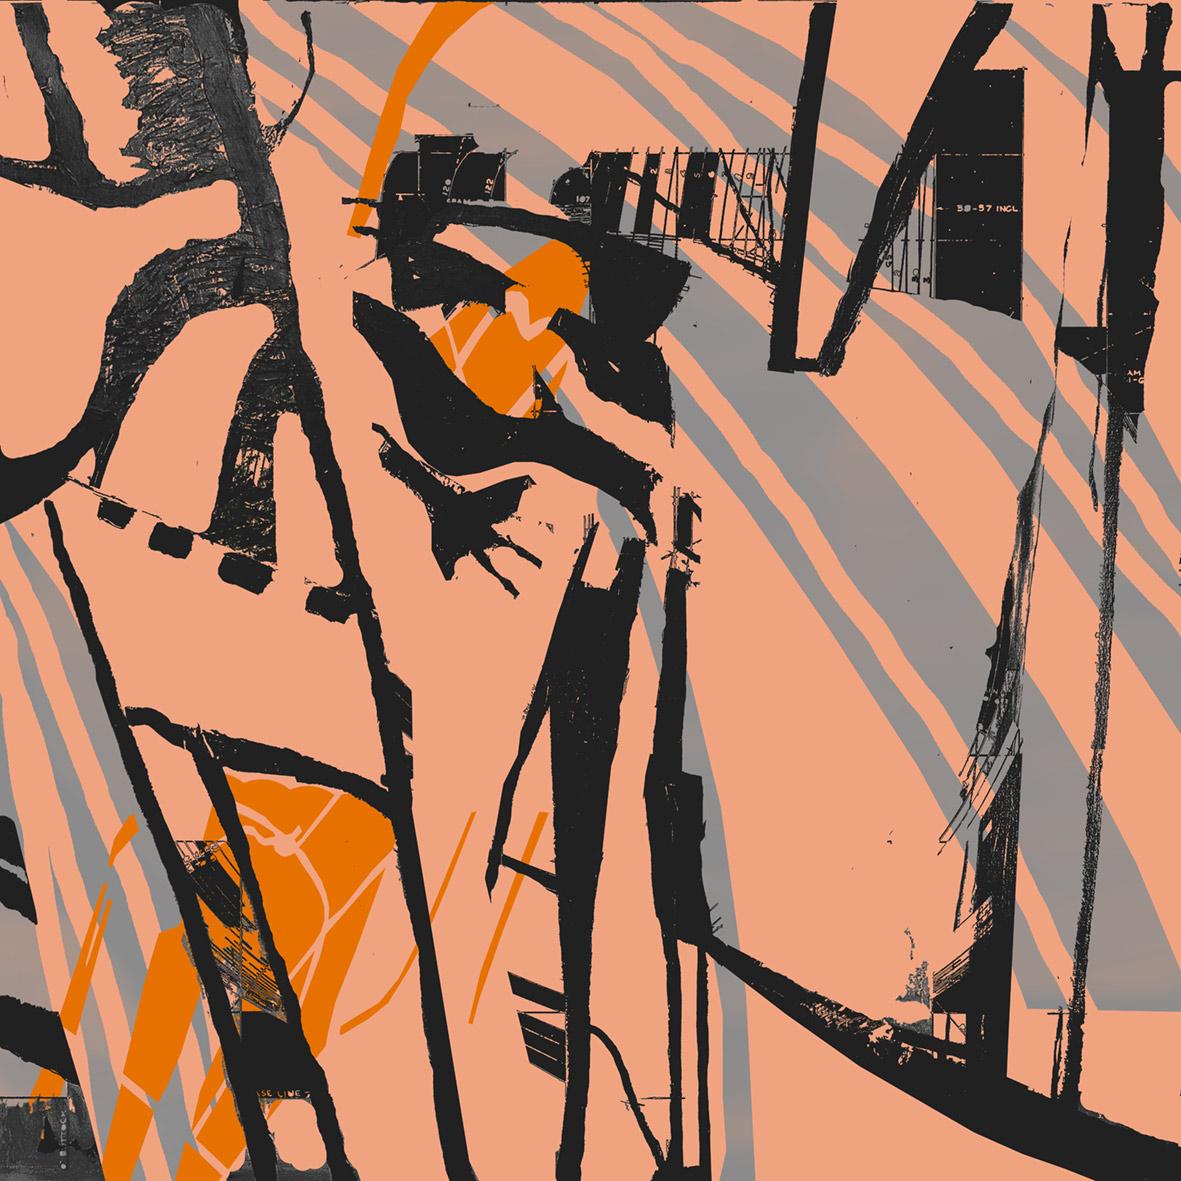 Lars Malmberg artprints